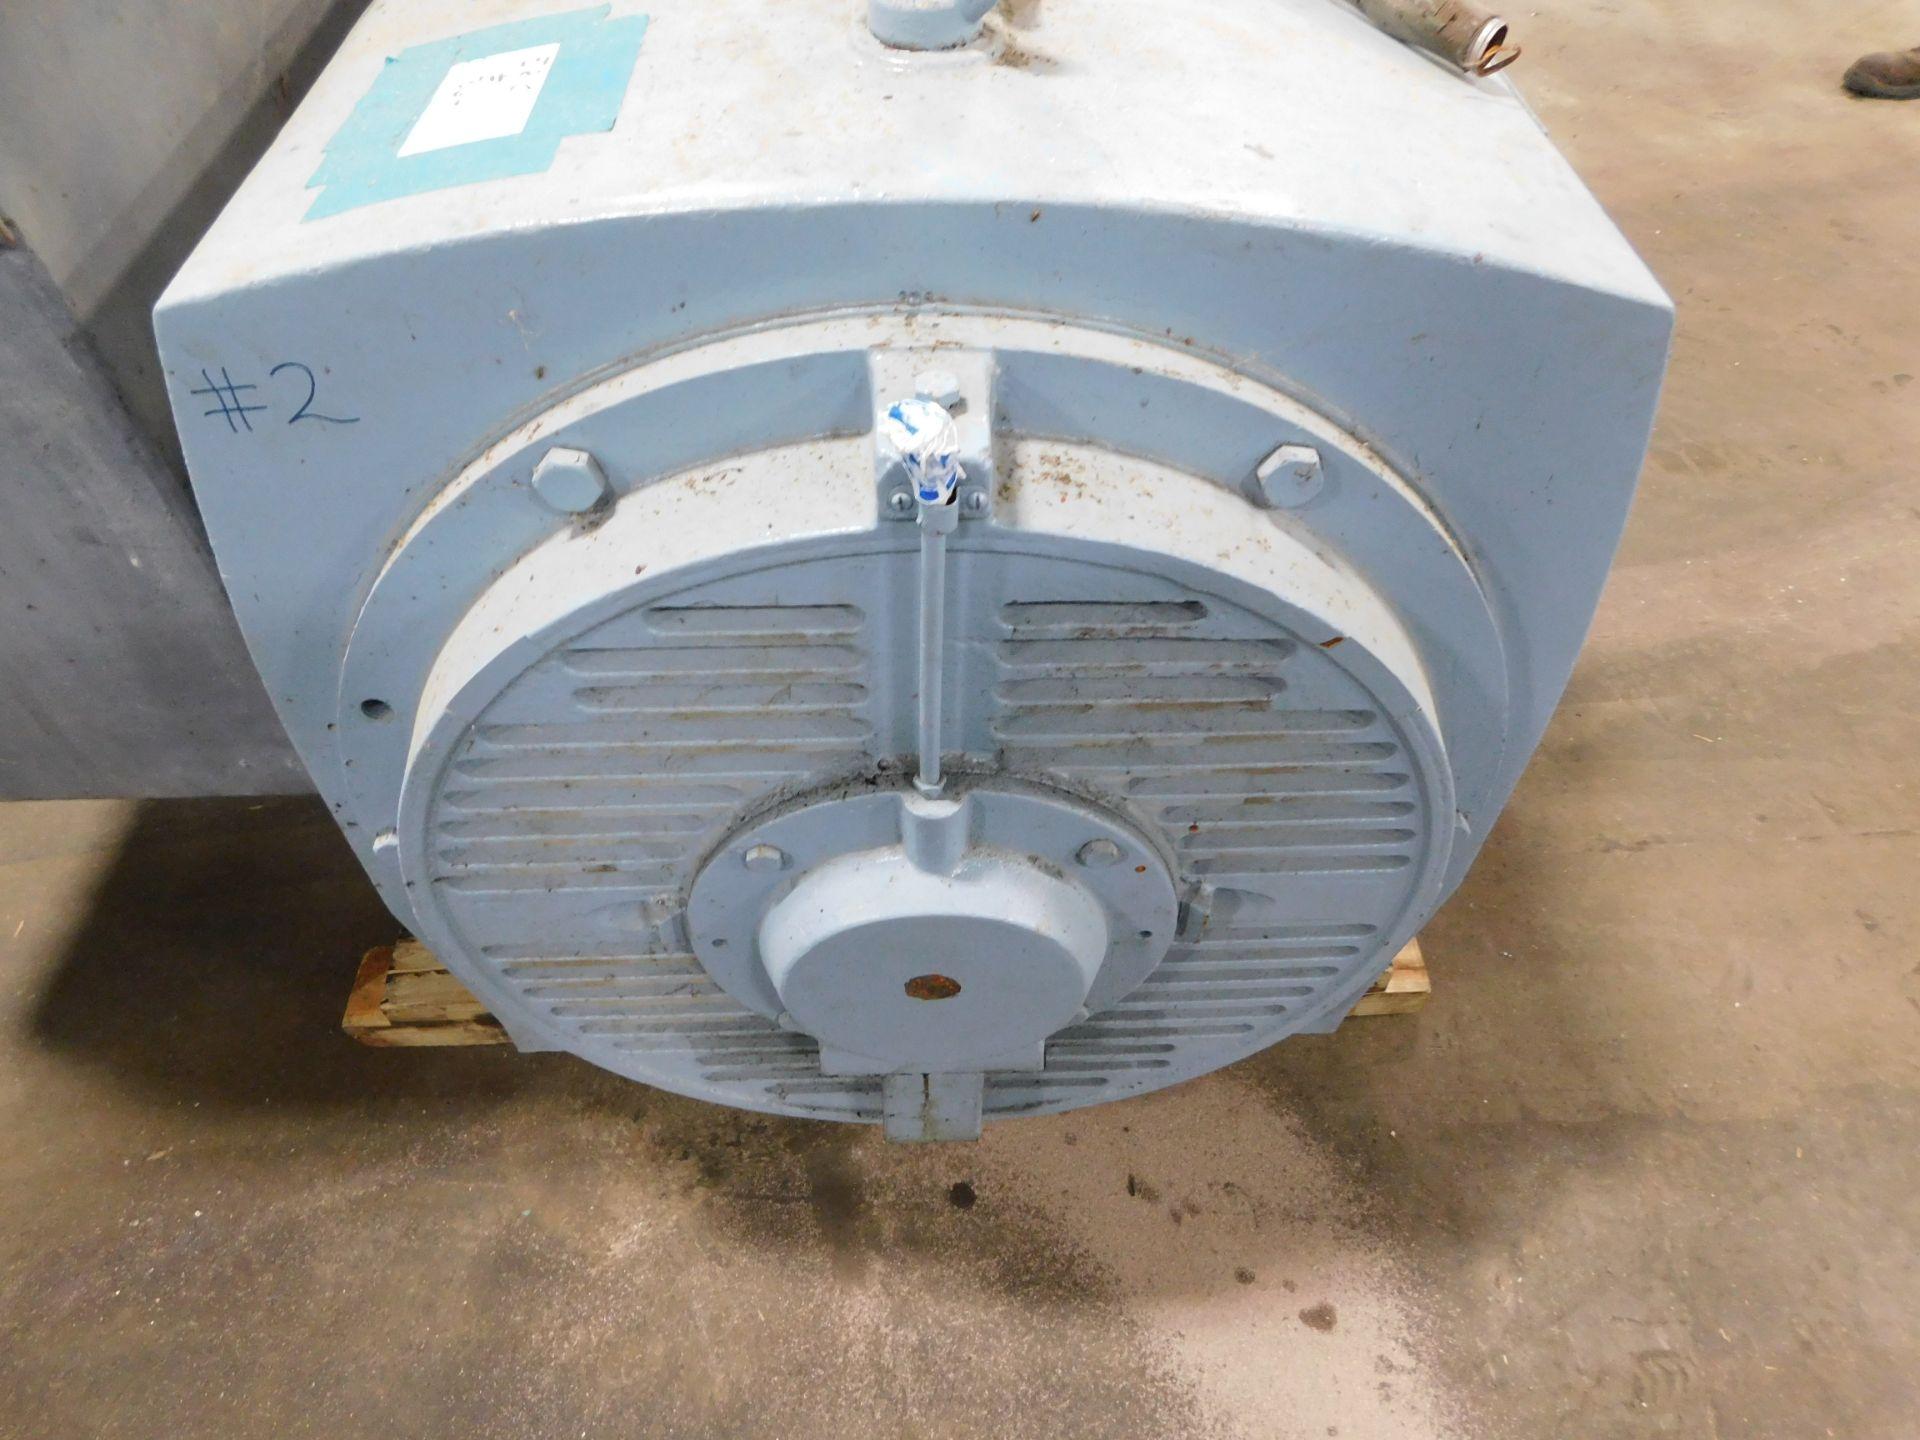 Teco Induction Motor. 600 HP. 3 Ph. 2300/4160 V. 60 Hz. 1780 RPM. 5808B. ASHA-PA001. - Image 3 of 6